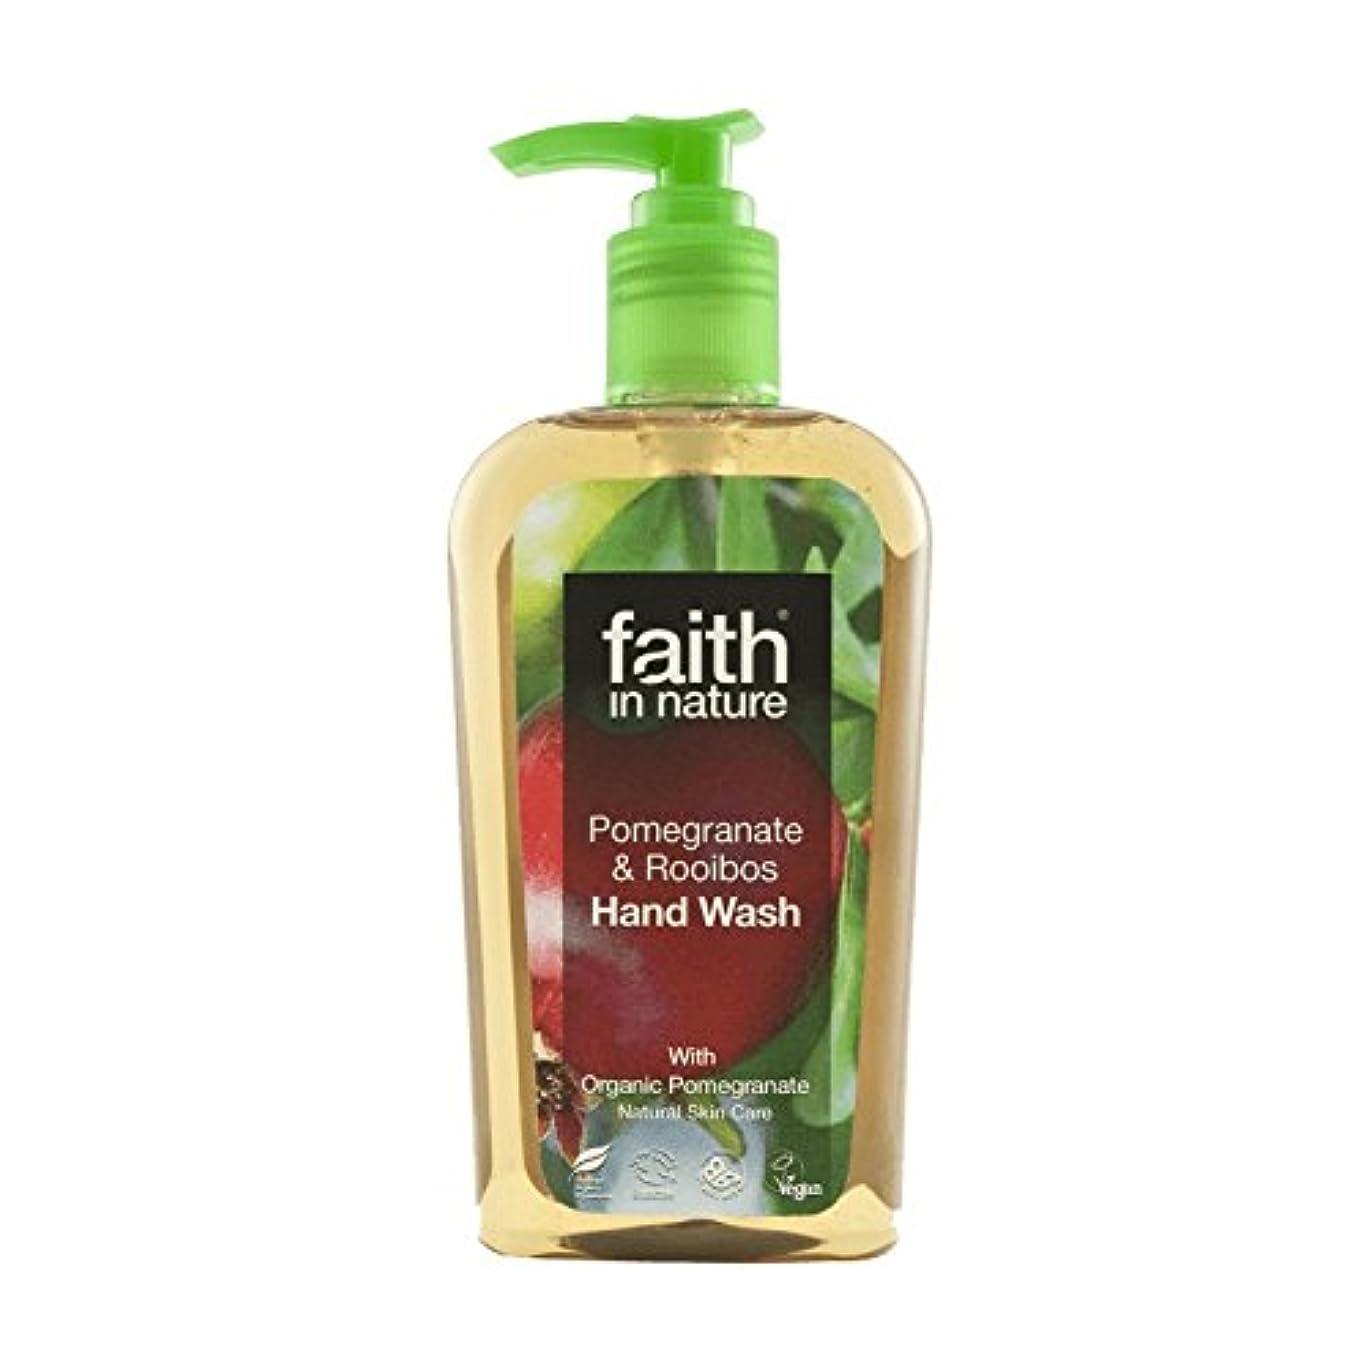 Faith In Nature Pomegranate & Rooibos Handwash 300ml (Pack of 6) - 自然ザクロ&ルイボス手洗いの300ミリリットルの信仰 (x6) [並行輸入品]